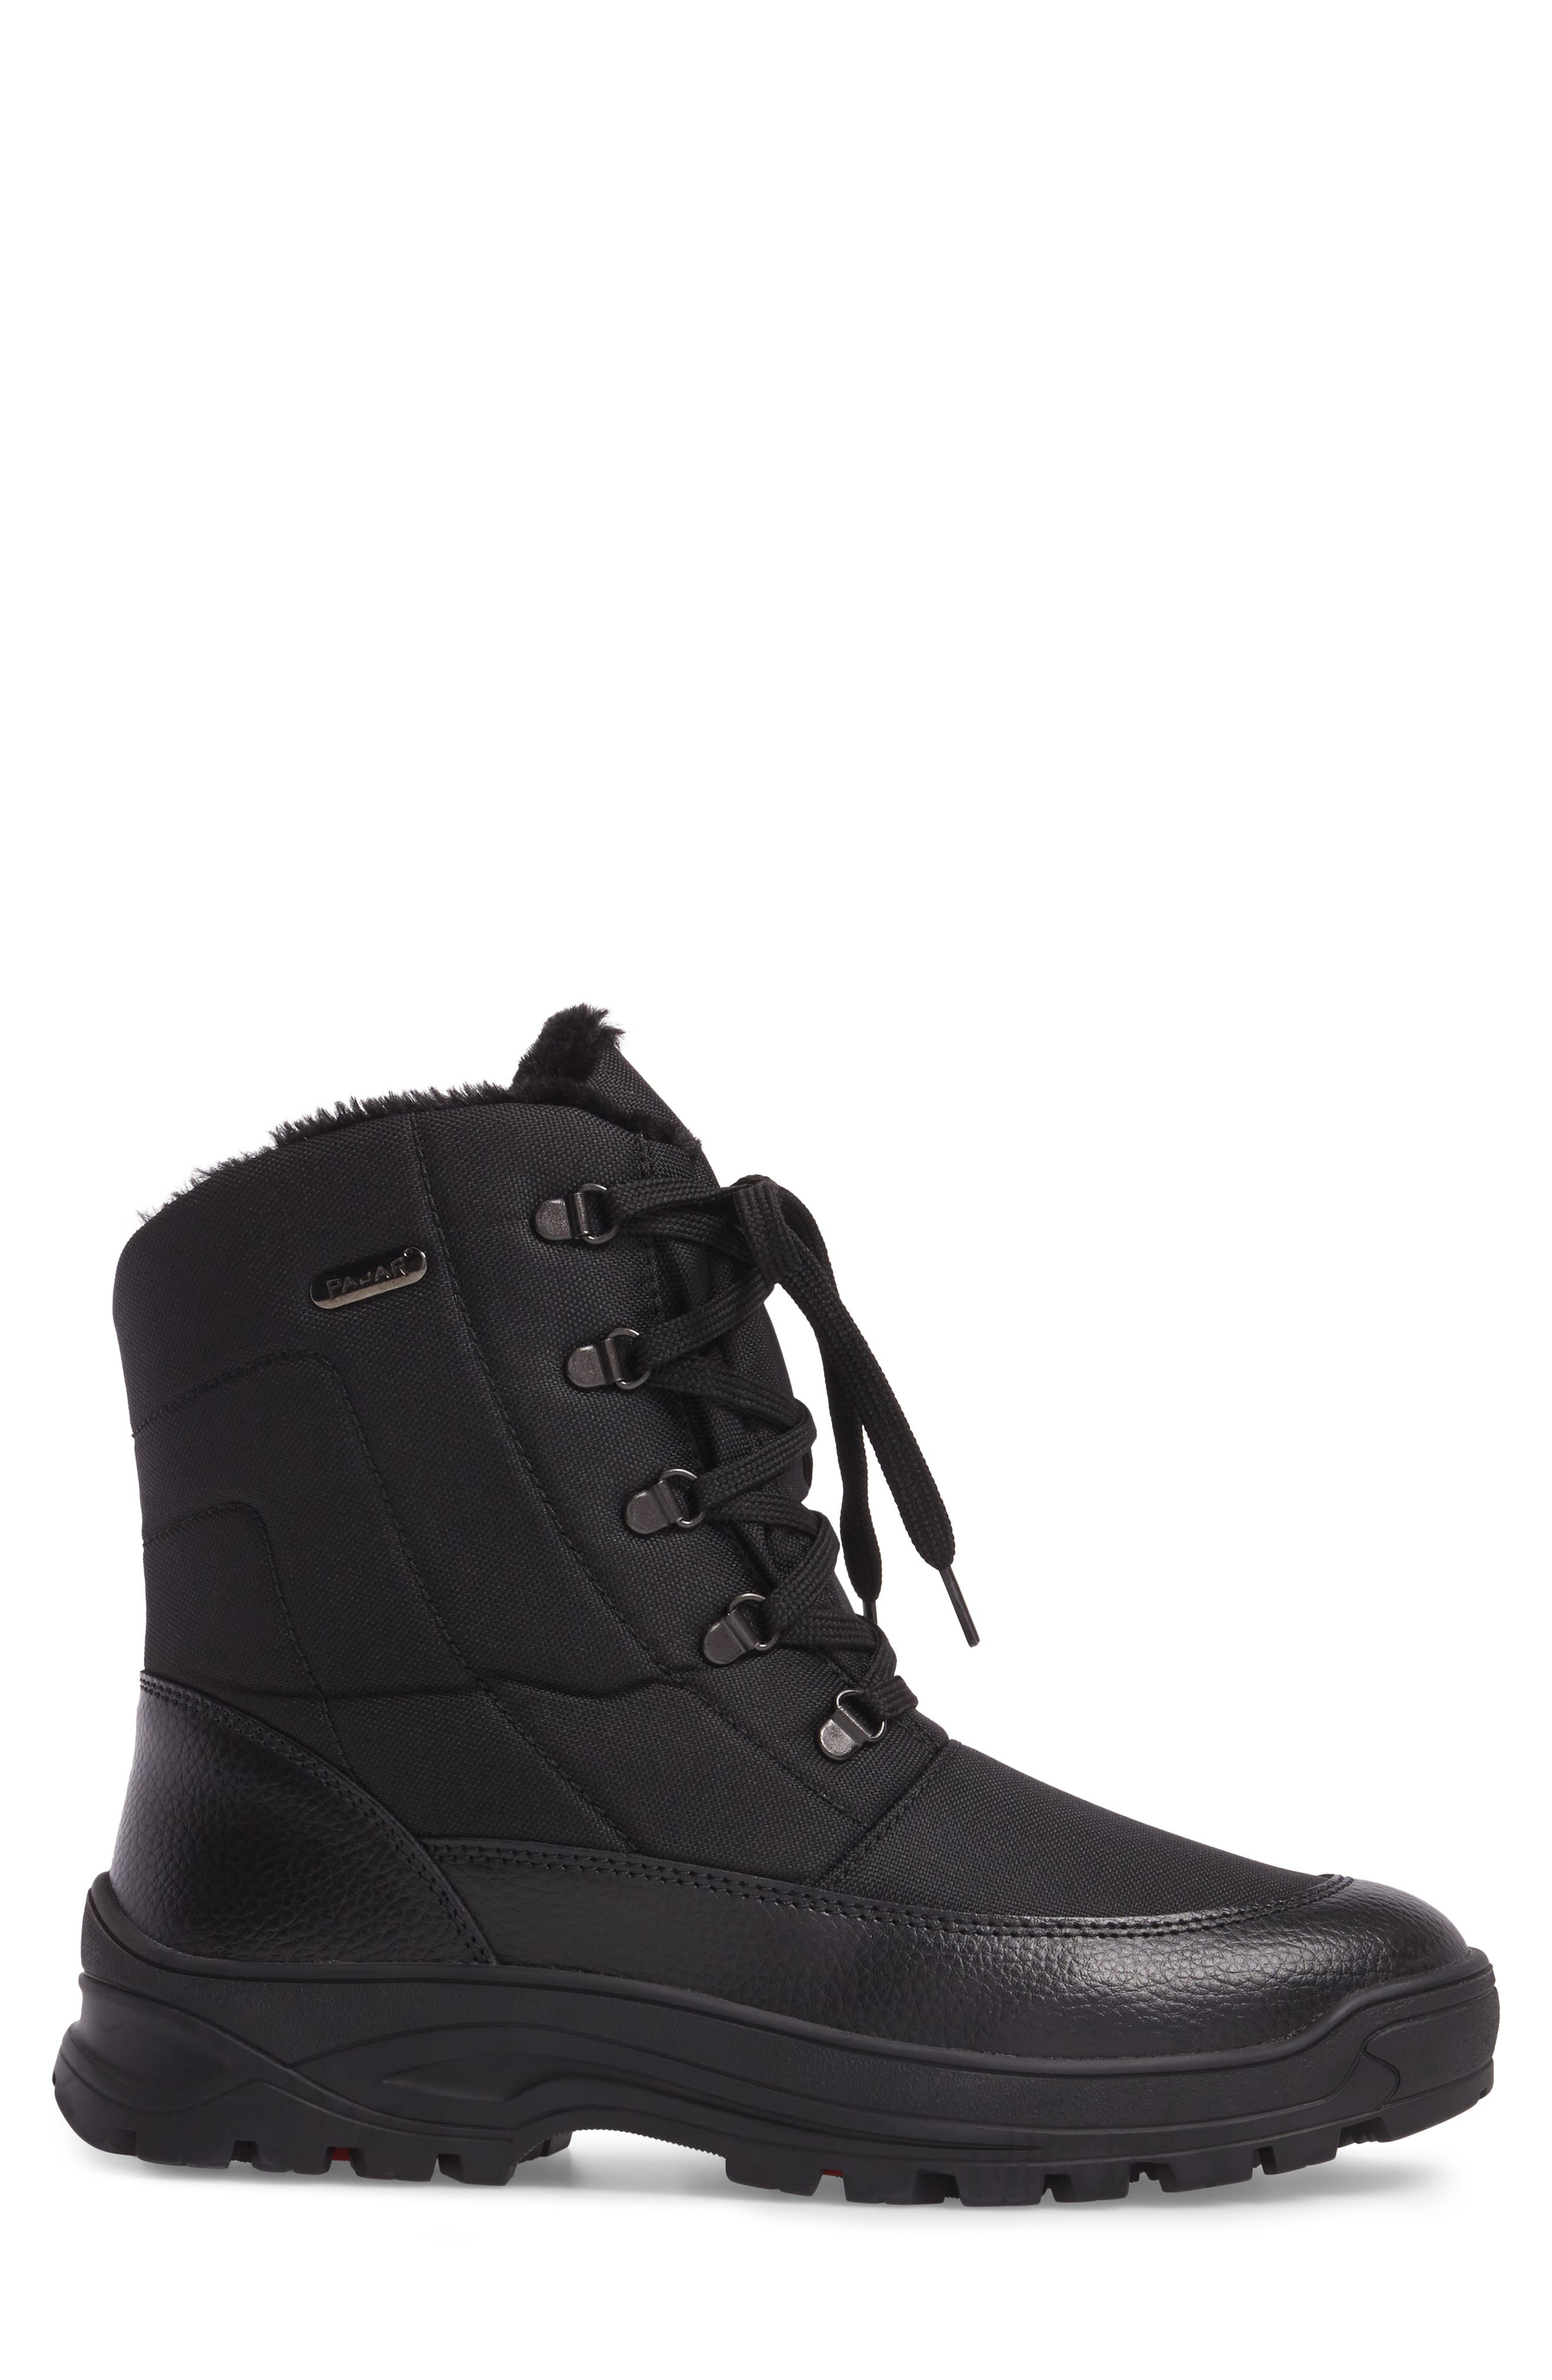 Trigger Winter Boot,                             Alternate thumbnail 3, color,                             Black